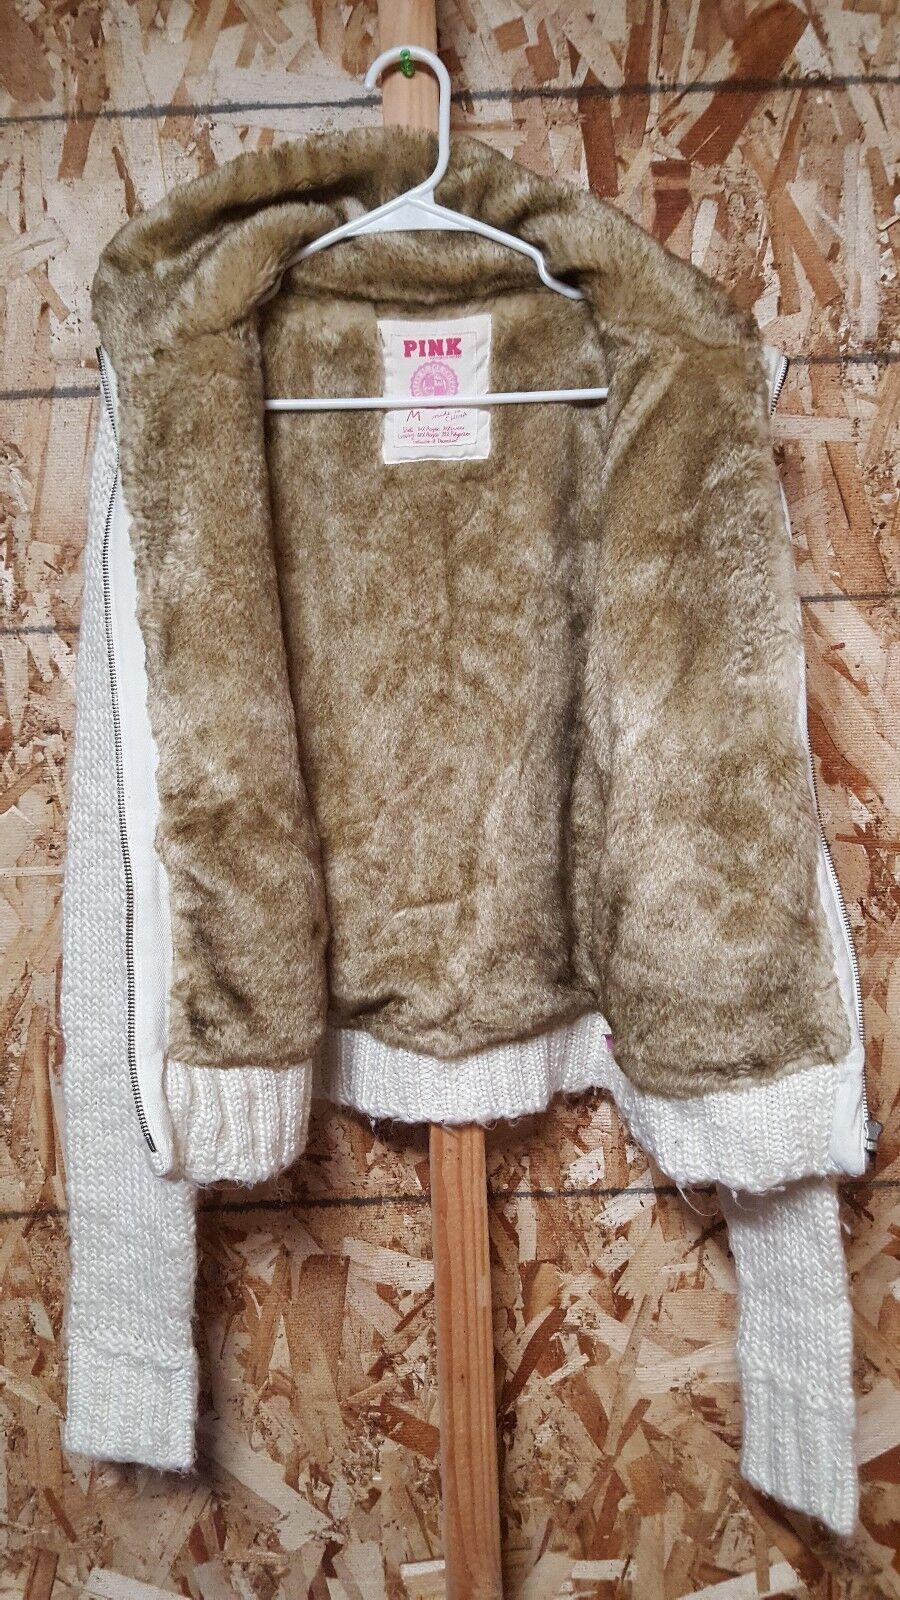 Victoria's Secret PINK faux Fur Lined Sweater Women's Medium